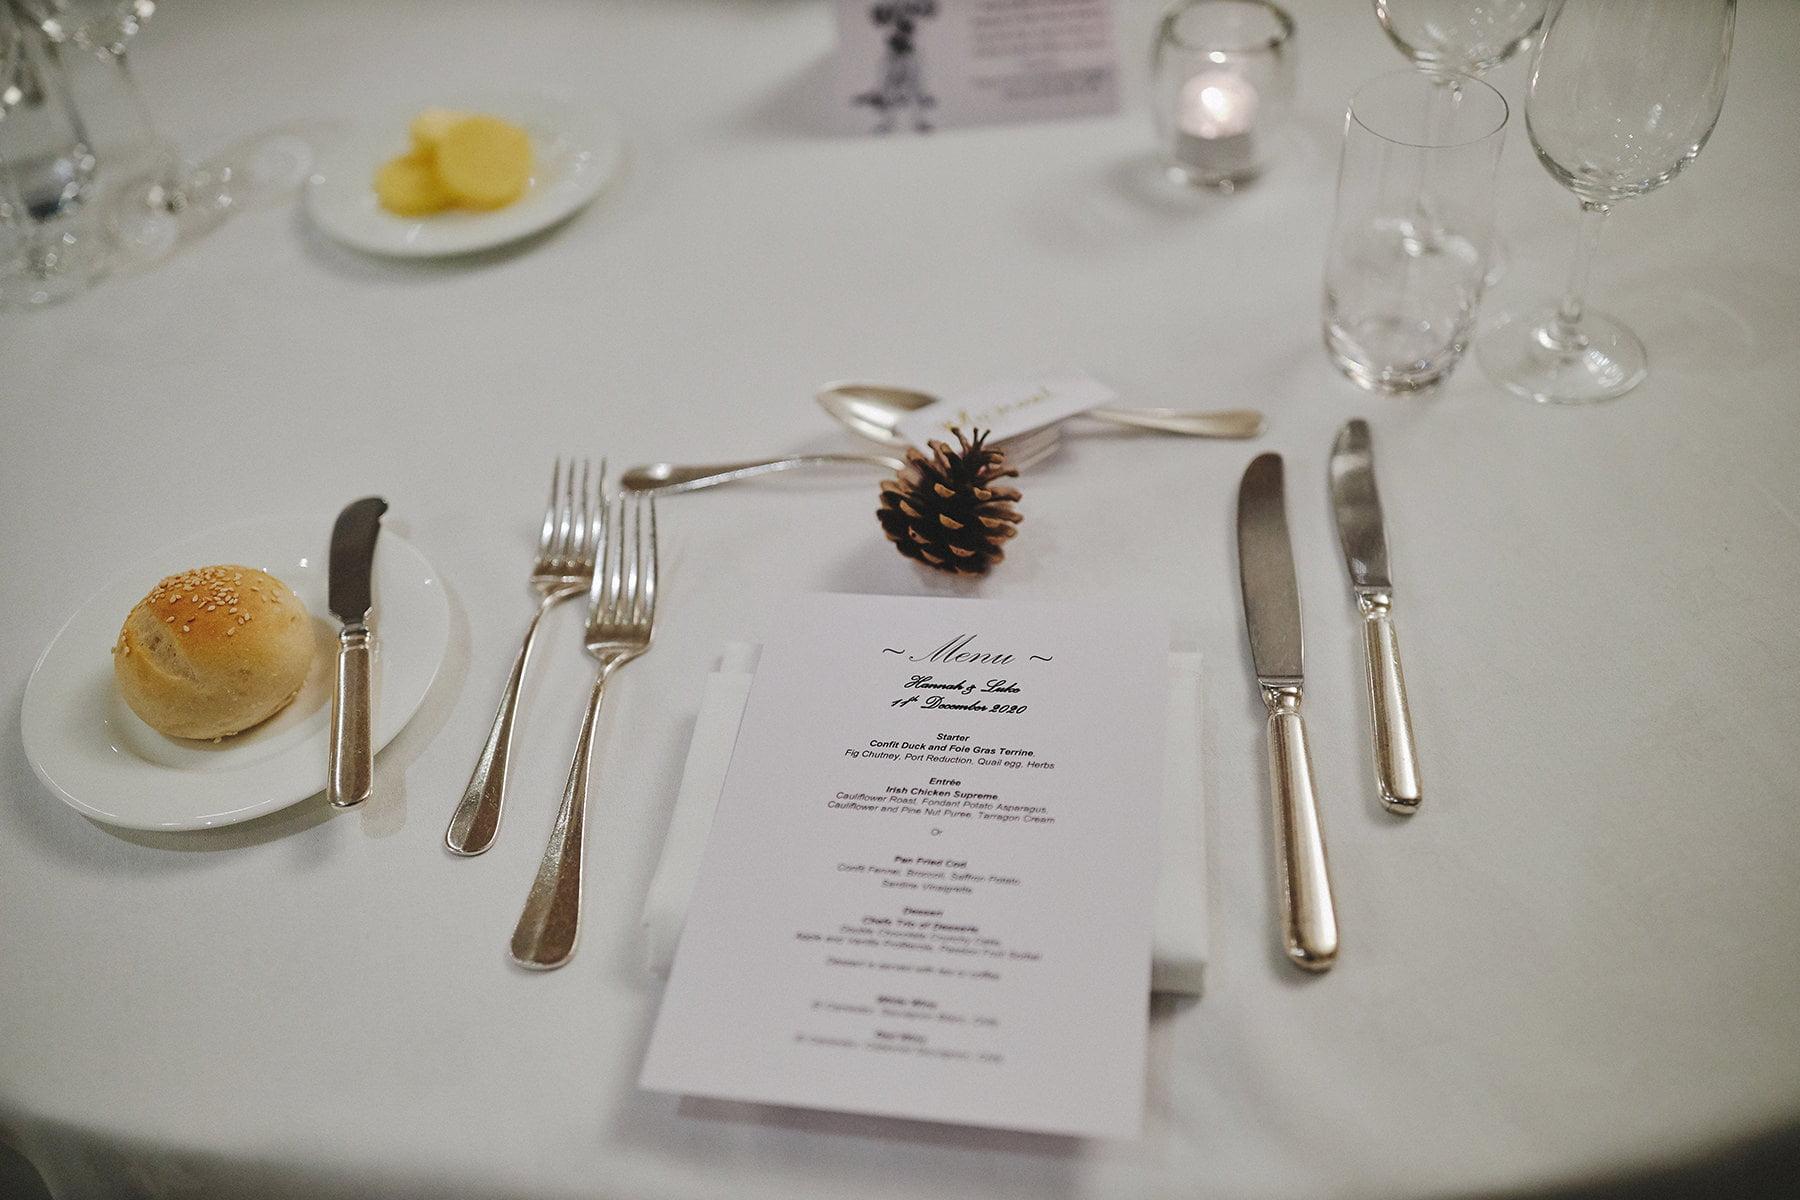 POWERSCOURT HOTEL RESORT INTIMATE WEDDING 84